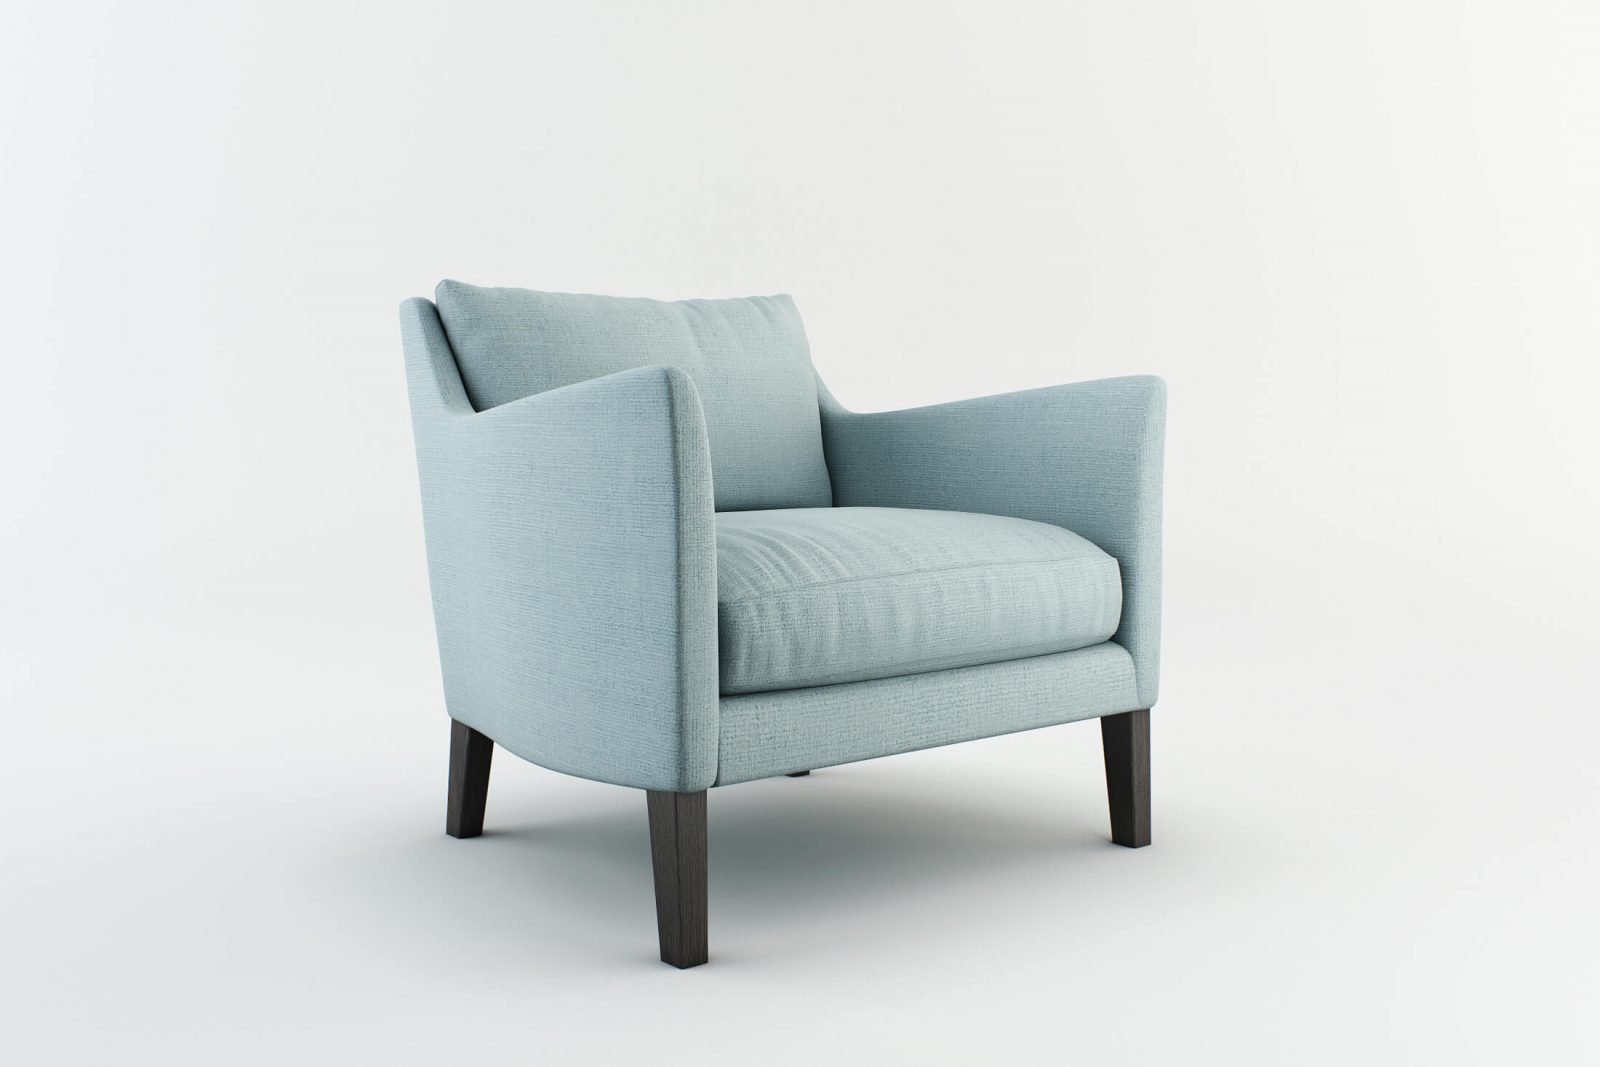 milan-chair-fix1-view1-fin